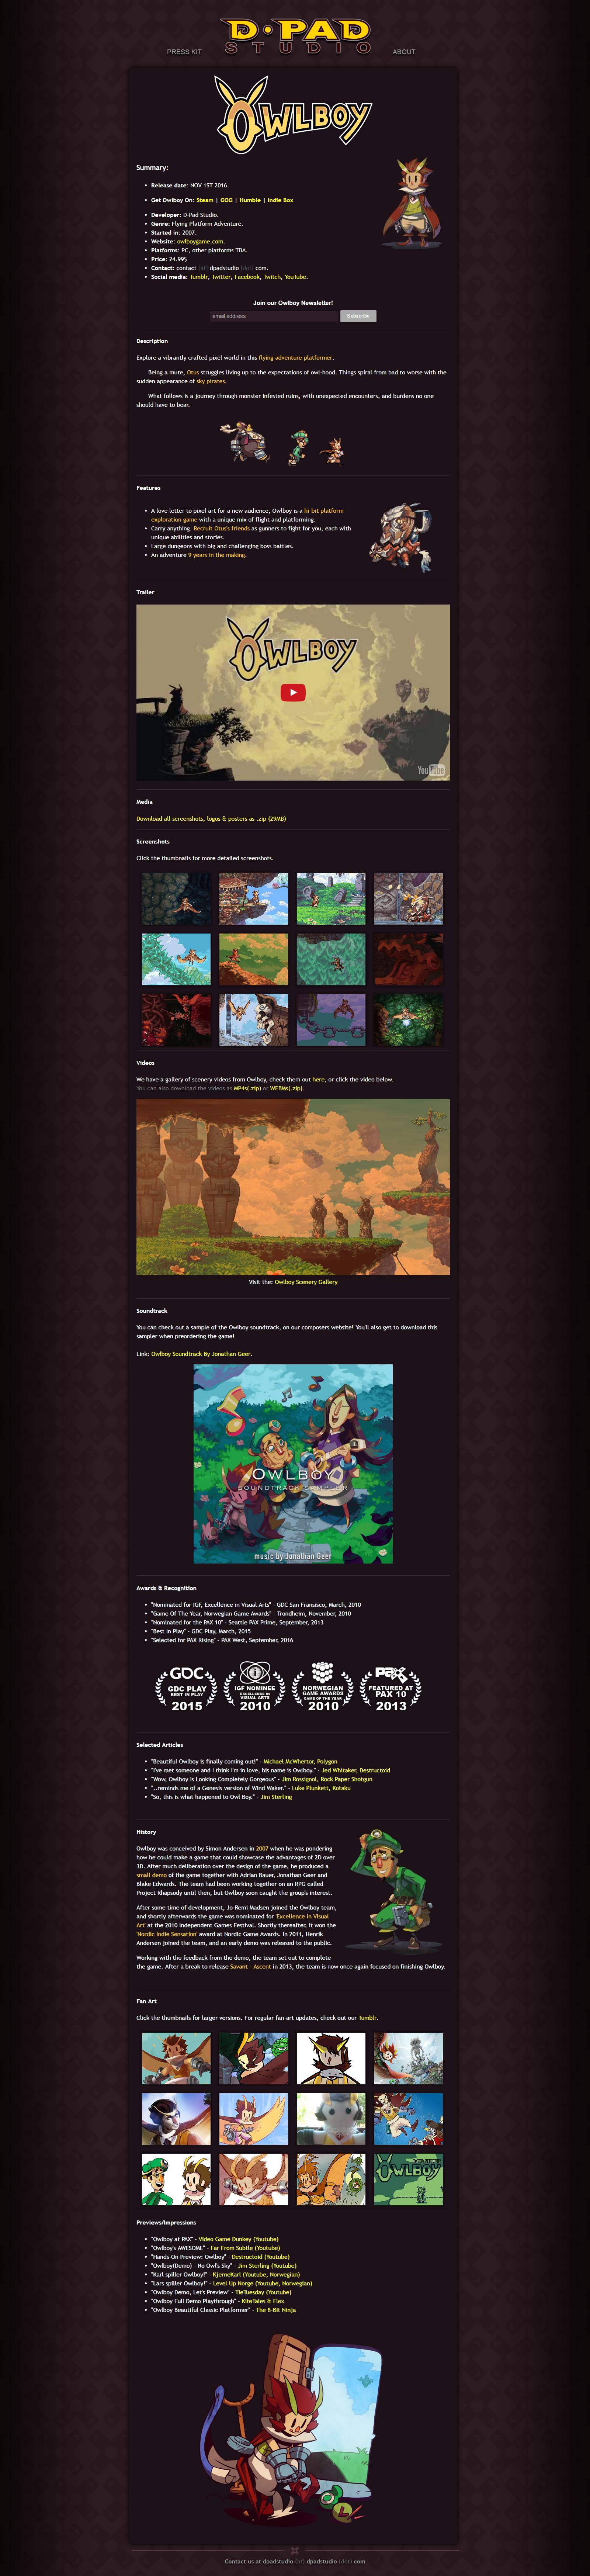 Video Games Sites